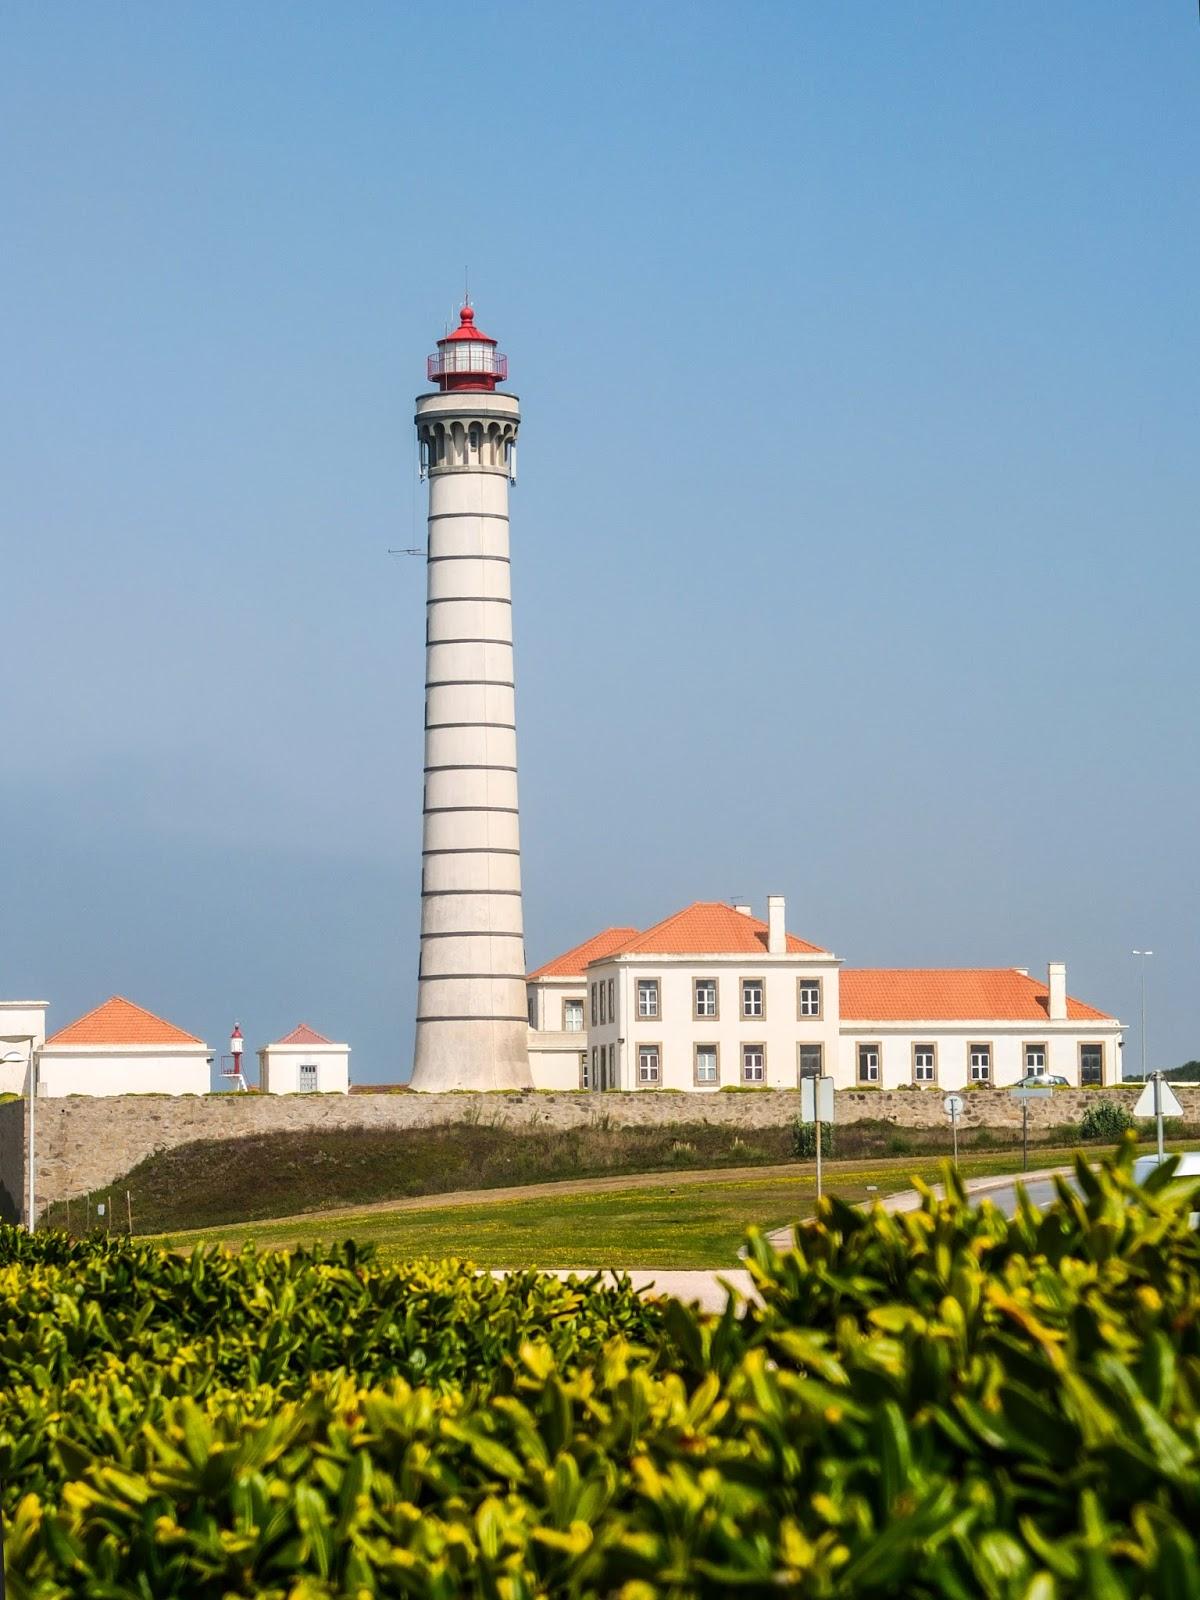 View over the hedge of the Leça Da Palmeira Lighthouse in Porto, Portugal.